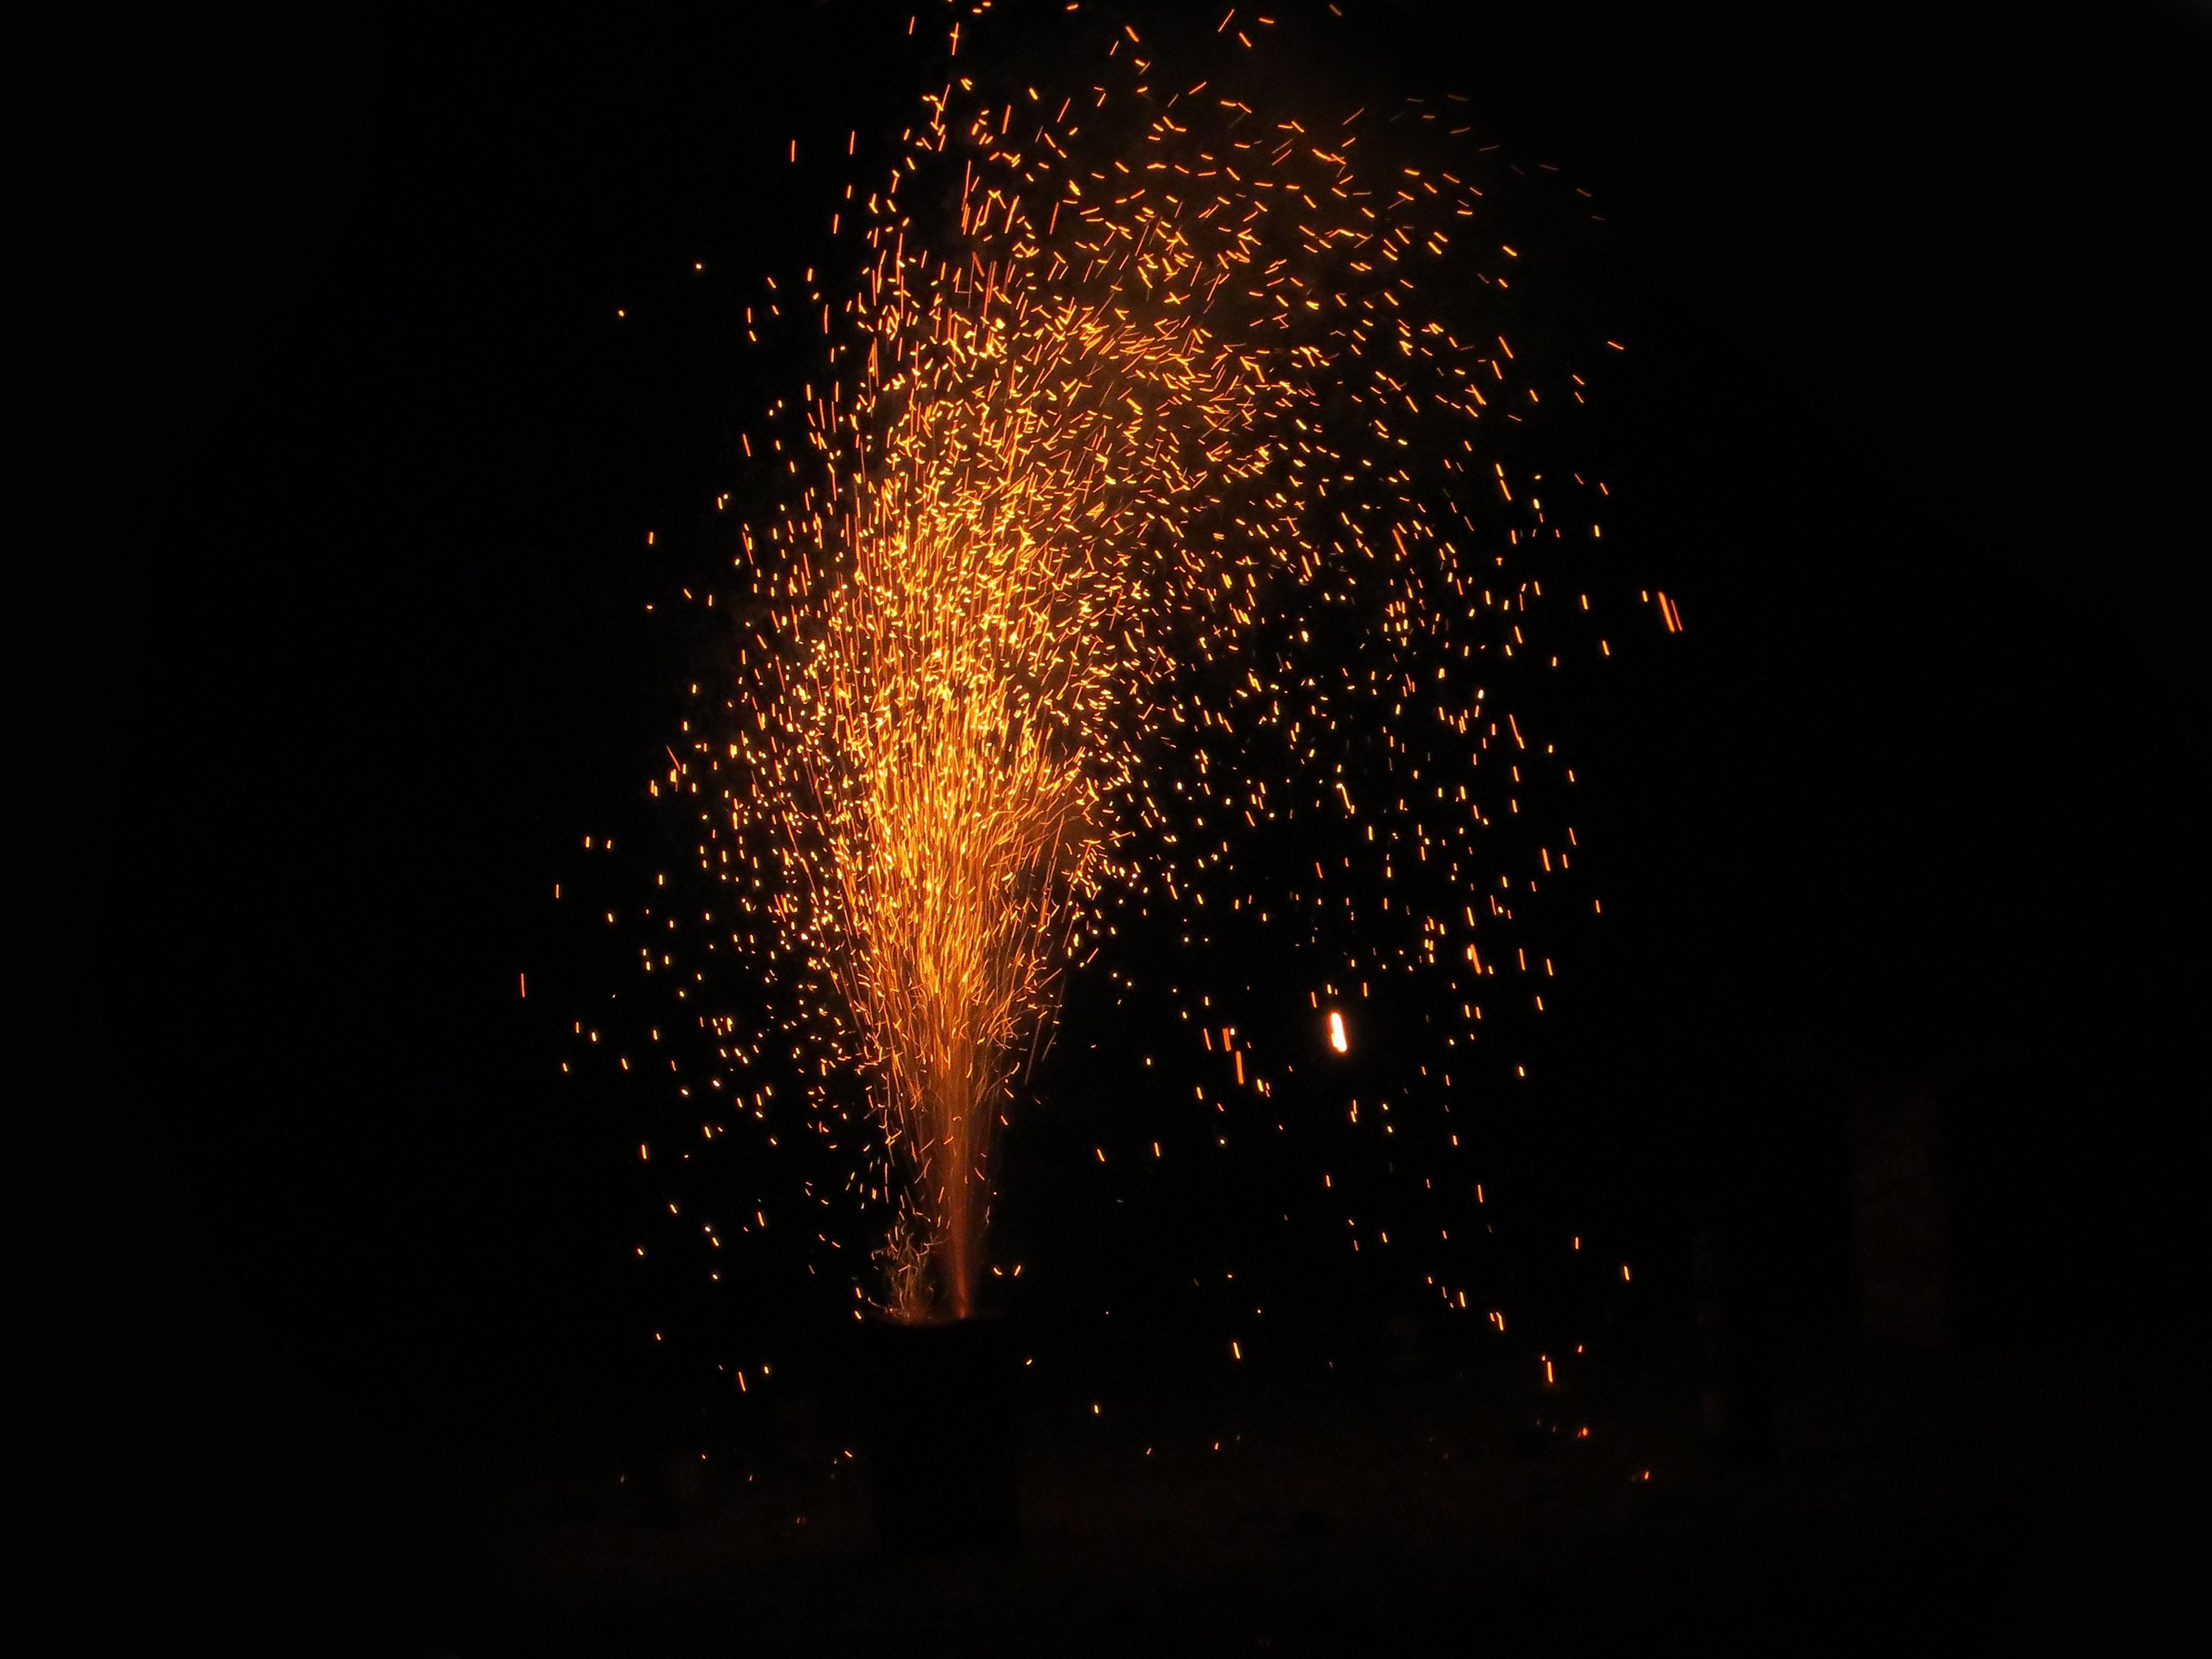 orange fireworks